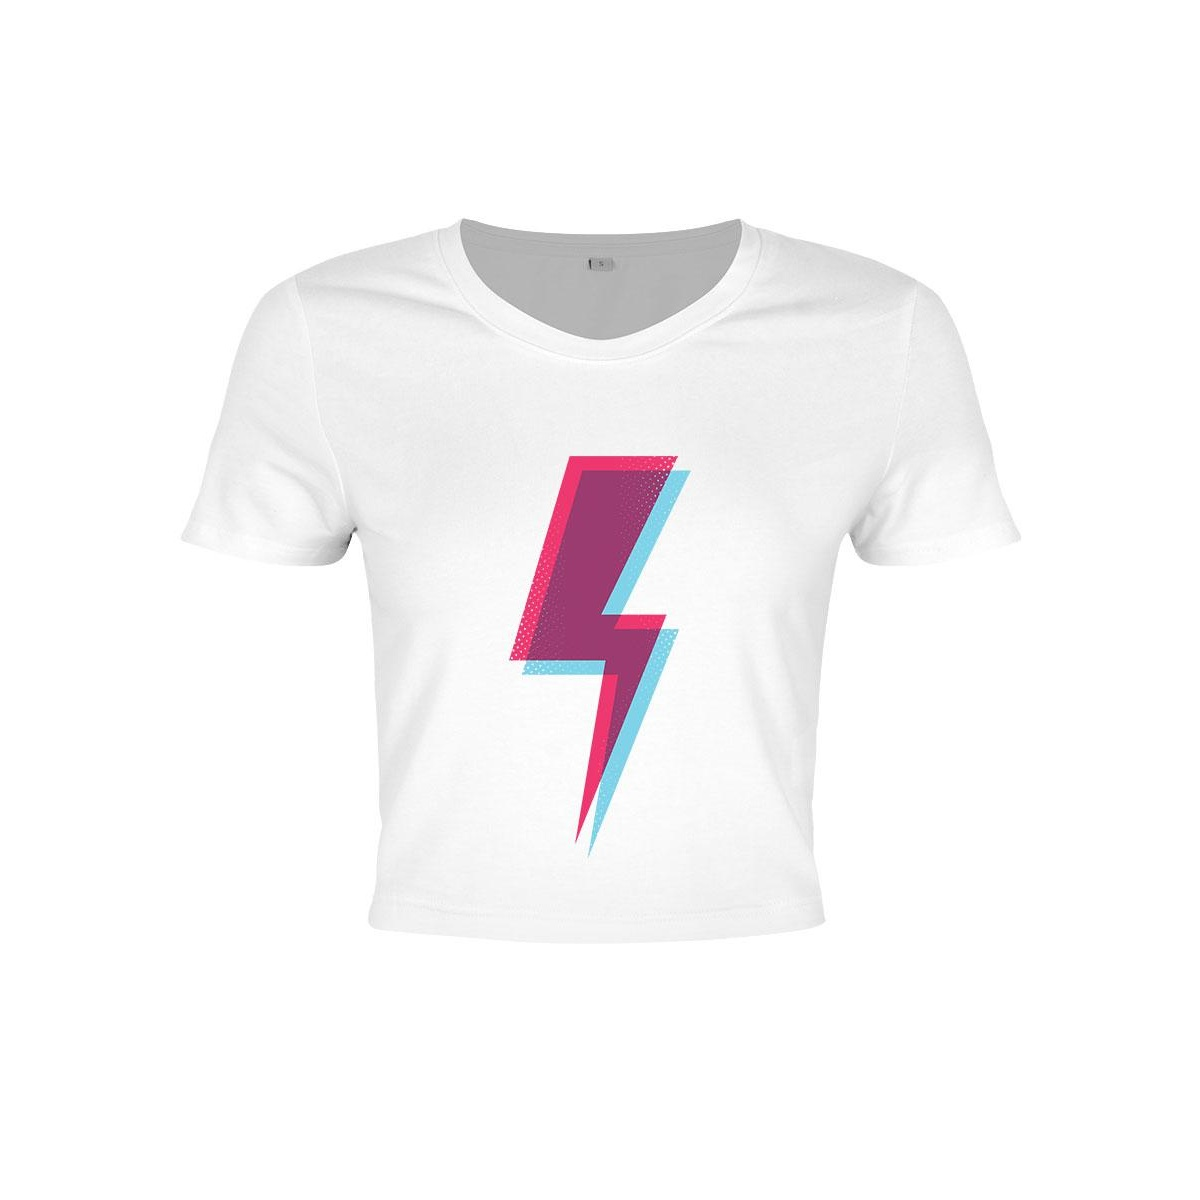 Grindstore Womens/Ladies Lightning Bolt Crop Top (M) (White/Purple)